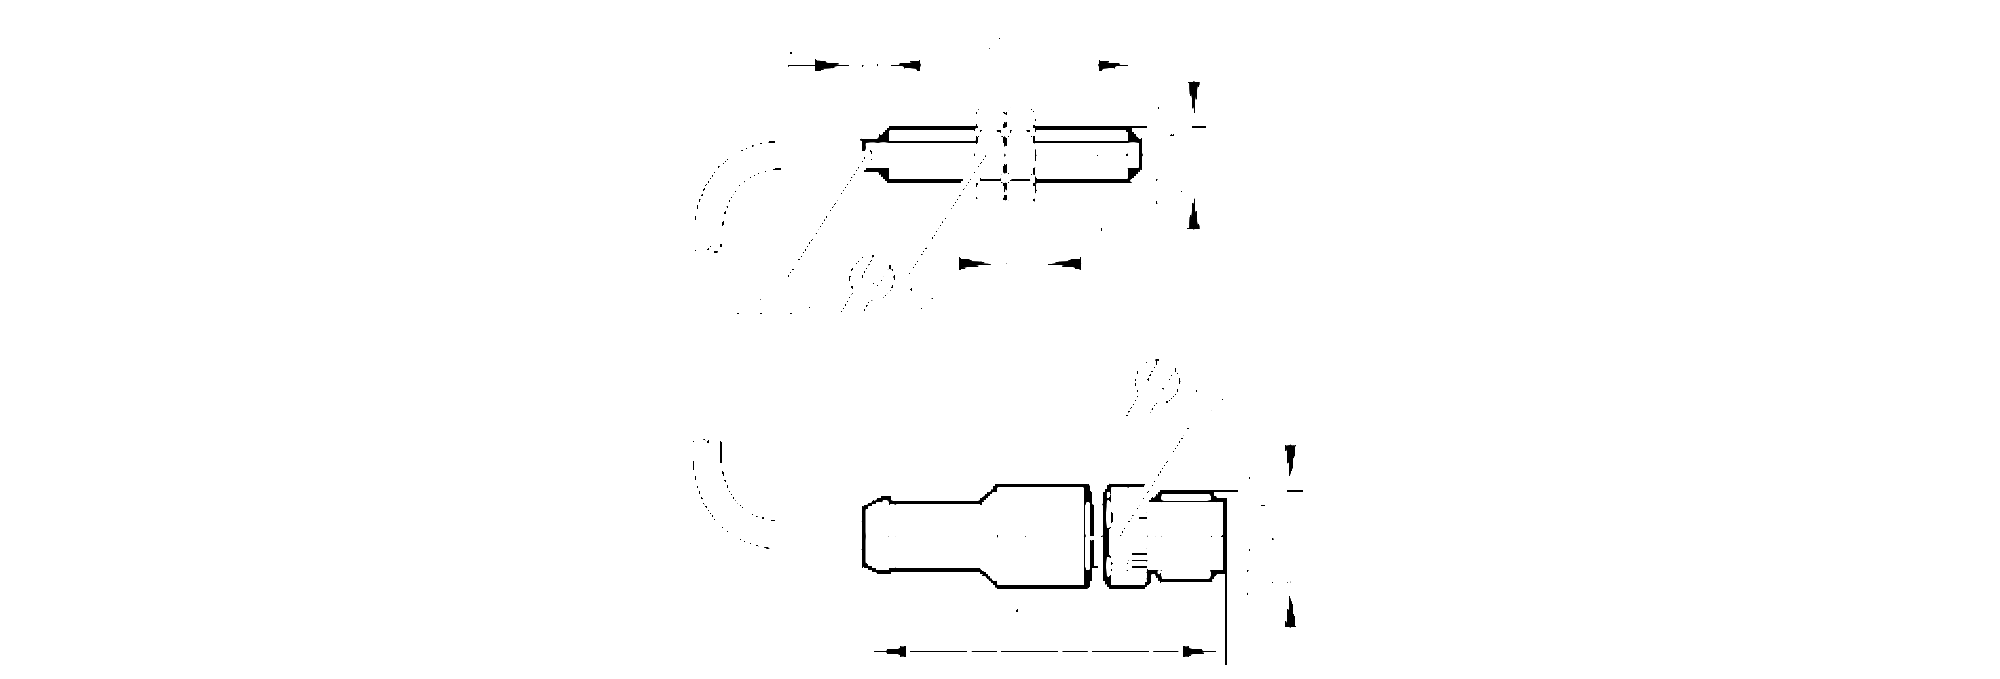 Ie5351 - Inductive Sensor